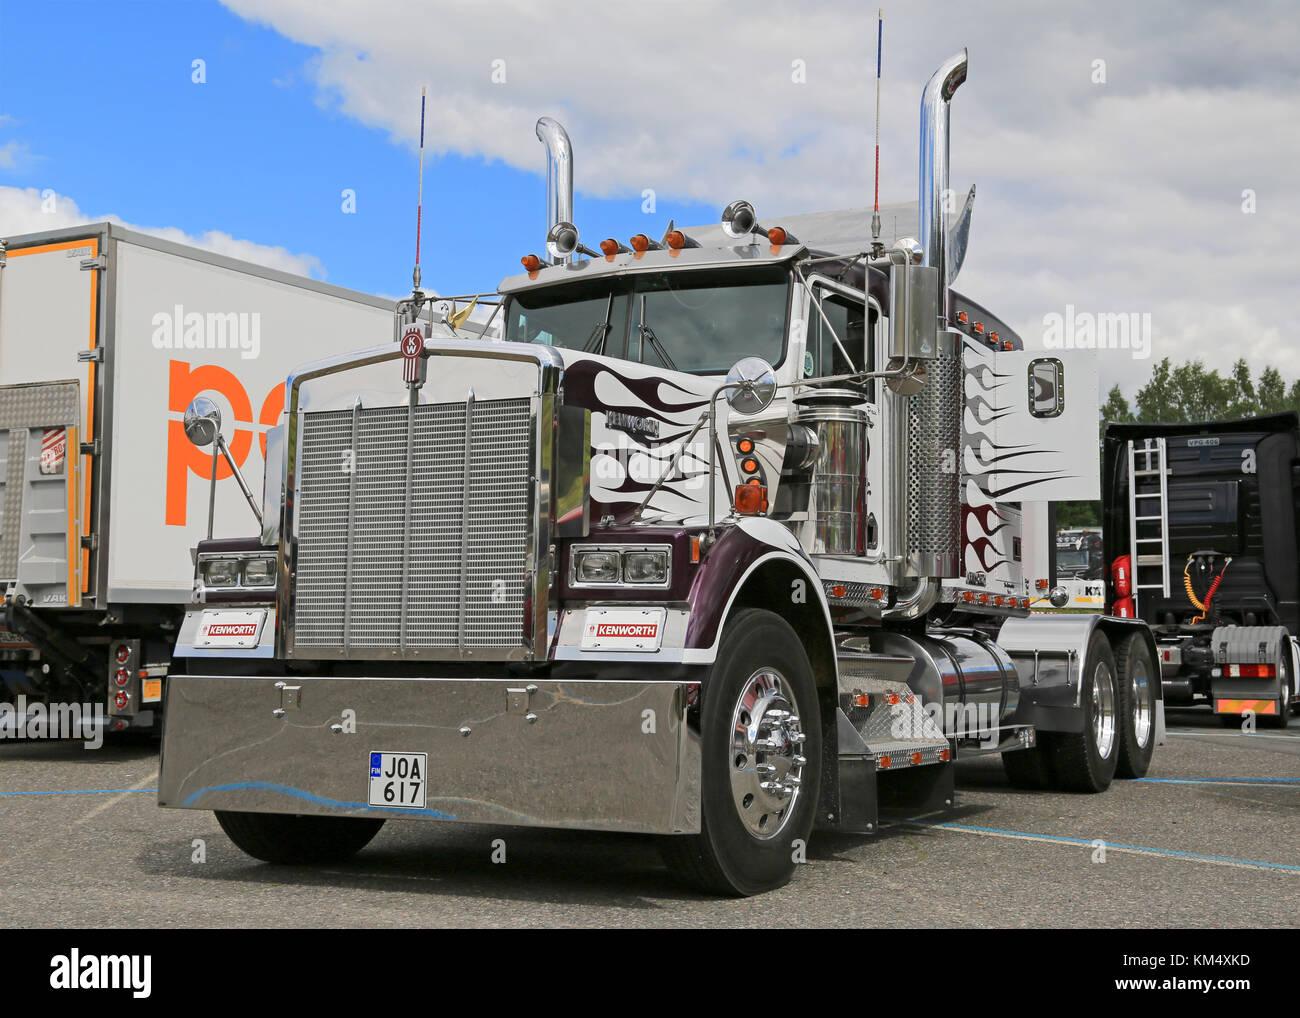 HAMEENLINNA, FINLAND - JULY 11, 2015: Classic Kenworth truck tractor on display at Tawastia Truck Weekend 2015. - Stock Image